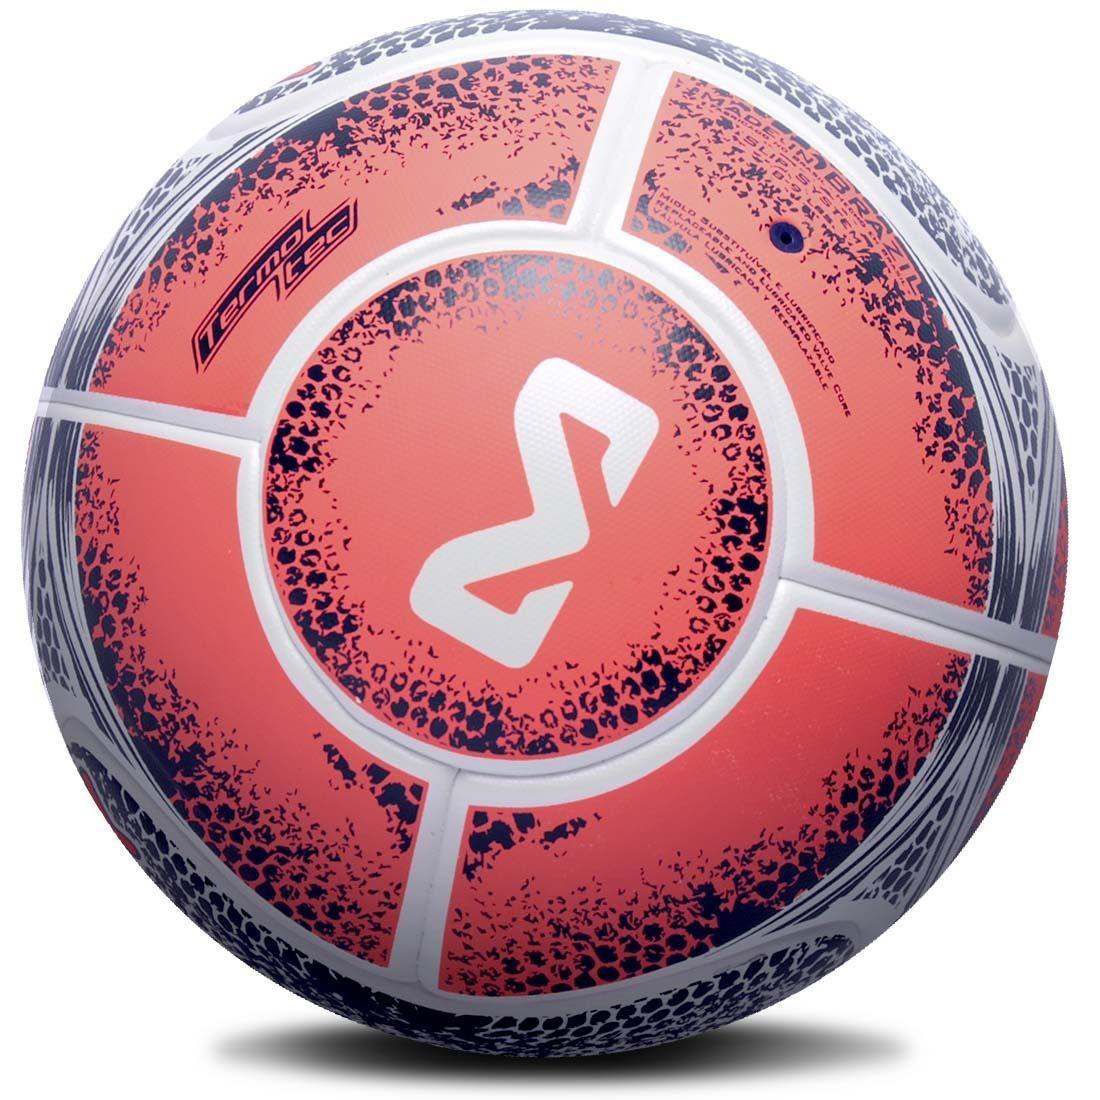 44a56215b7 Carregando zoom... bola futsal penalty max 1000 aprovada fifa 2018 original